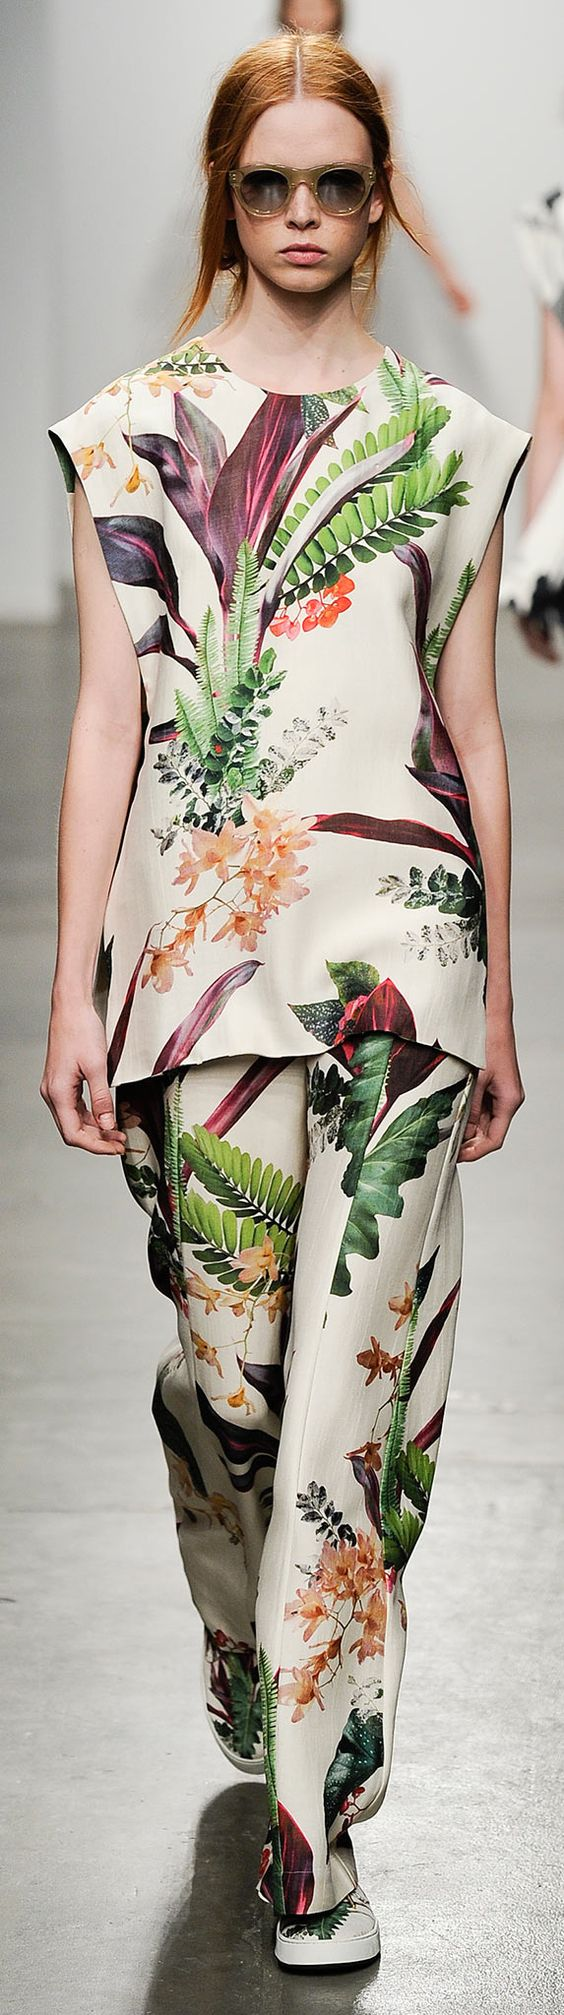 www.thefabricstore.com.au | Floral Inspiration - Osklen Spring 2015